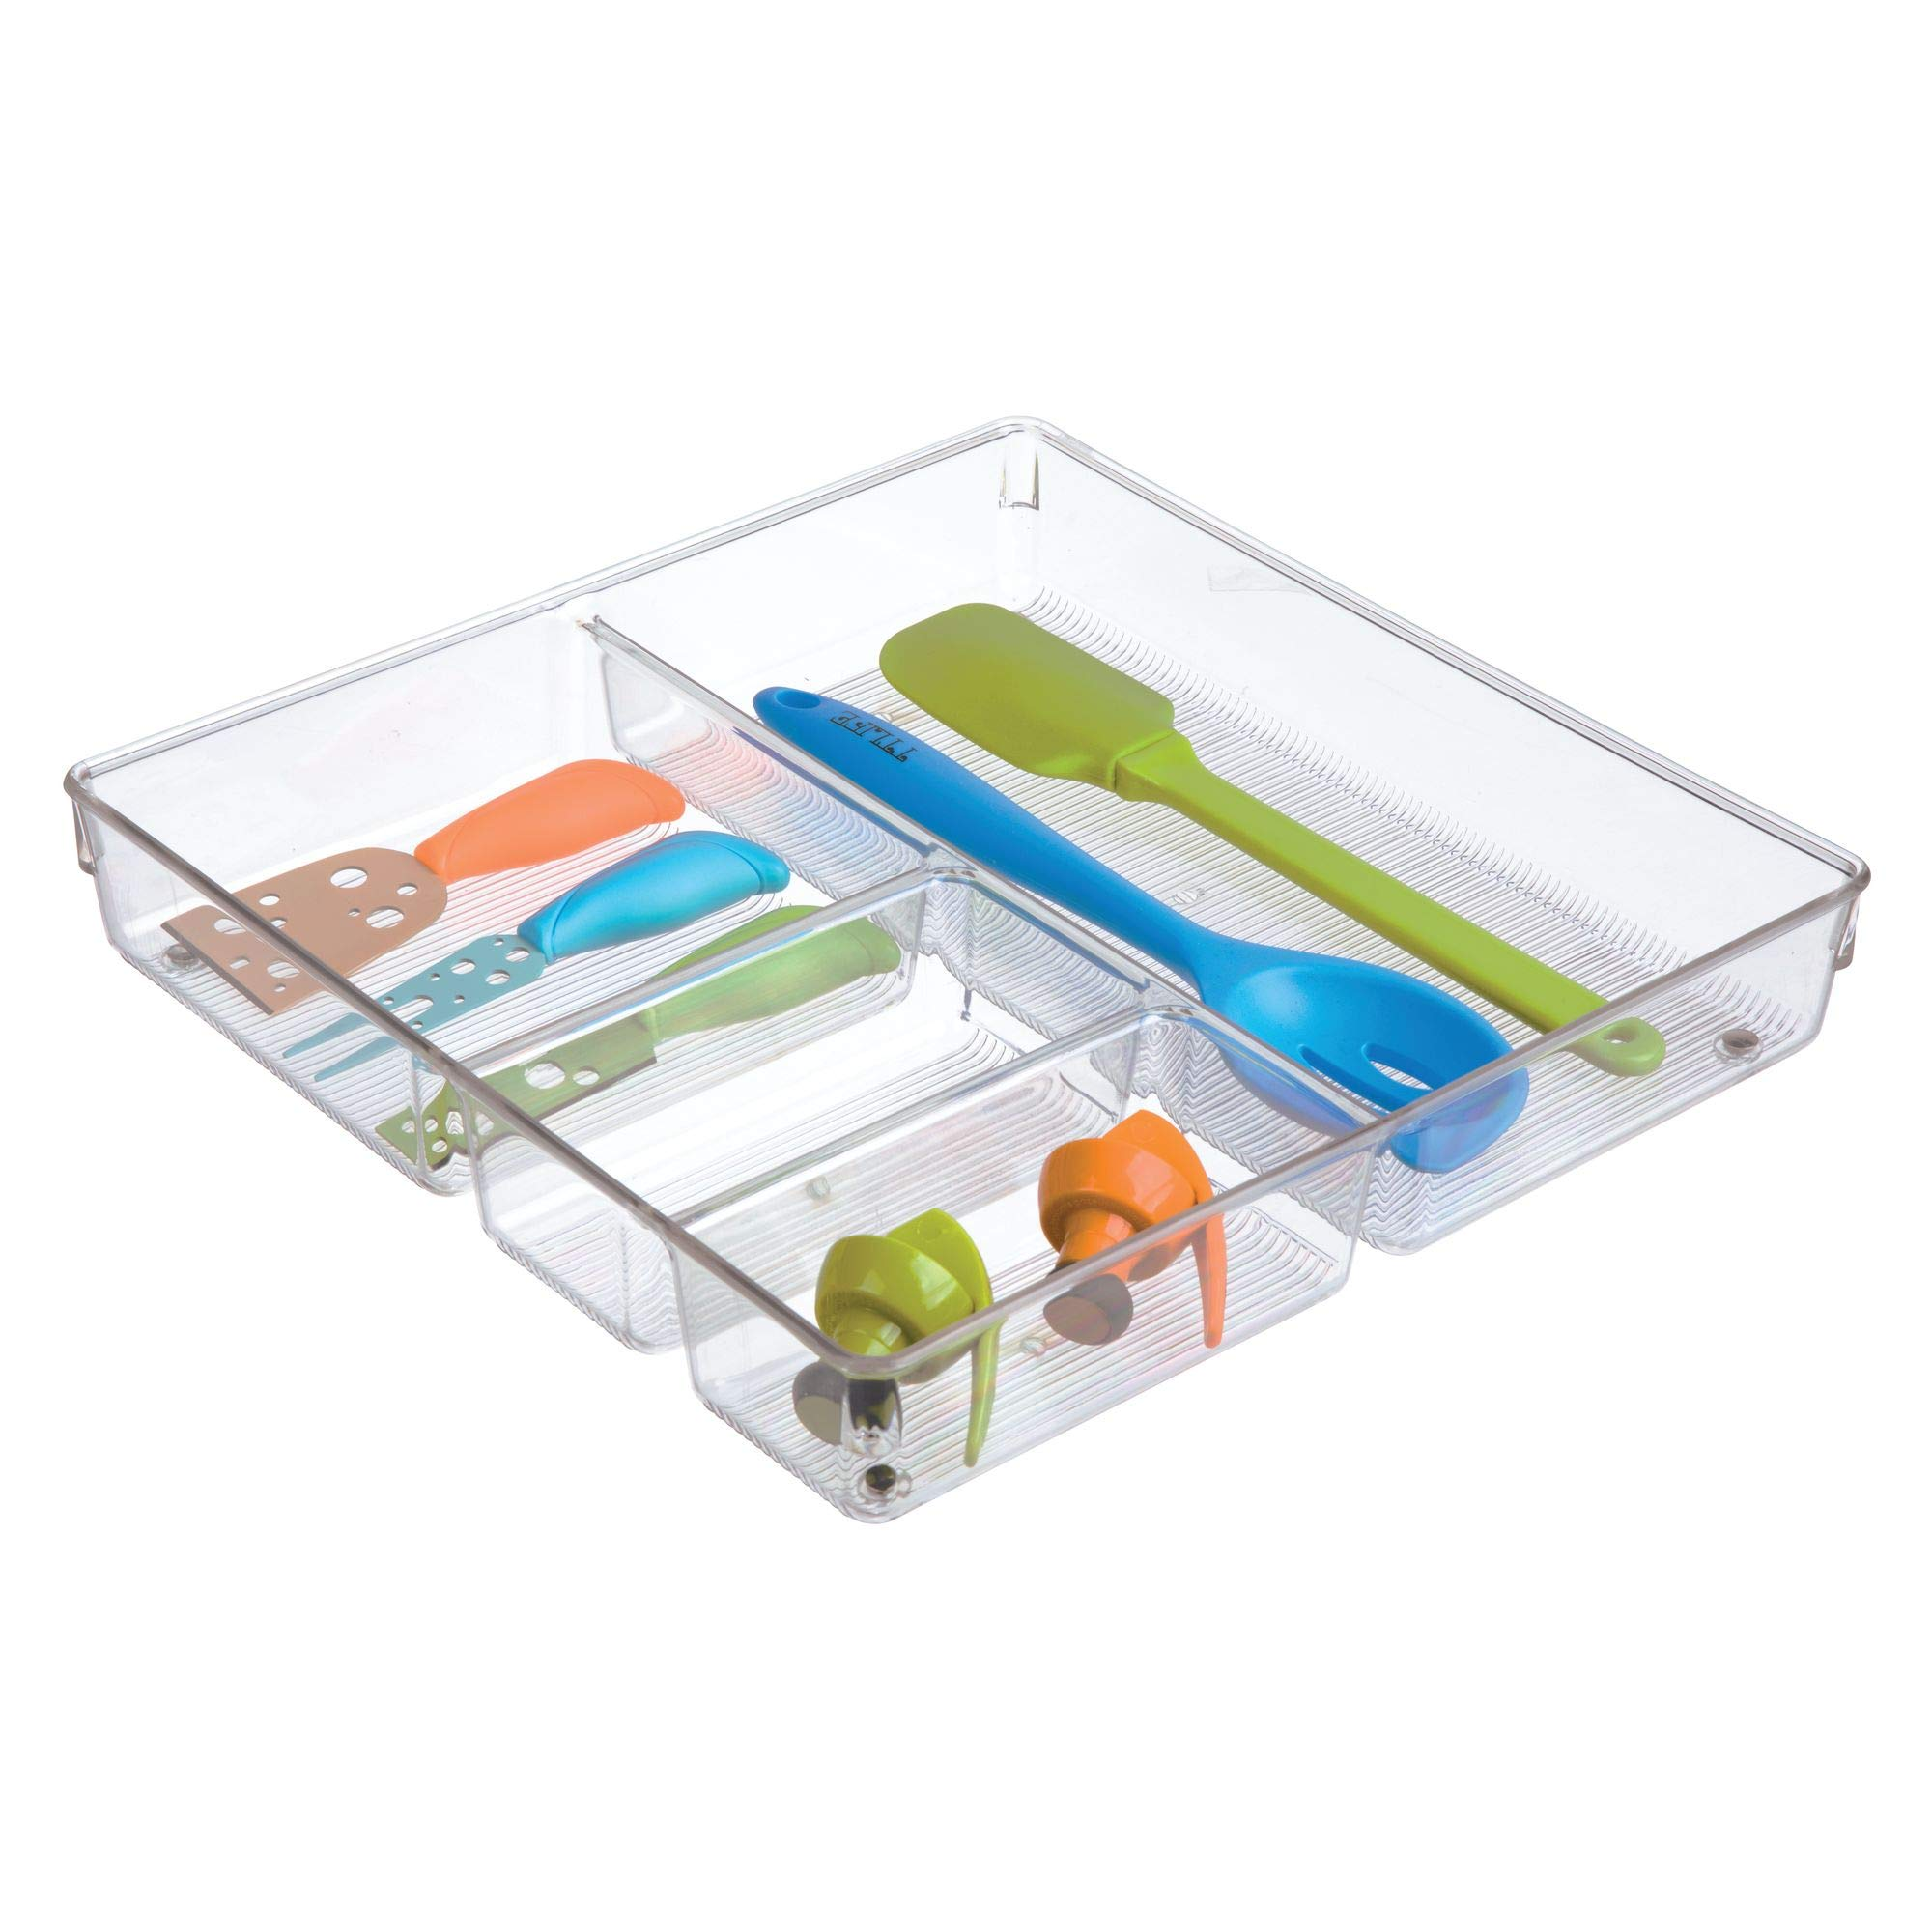 InterDesign Linus Plastic Grand Divided Organizer, Storage Container for Kitchen, Vanity, Bathroom Drawers, 12'' x 12'' x 2'' Clear by InterDesign (Image #3)